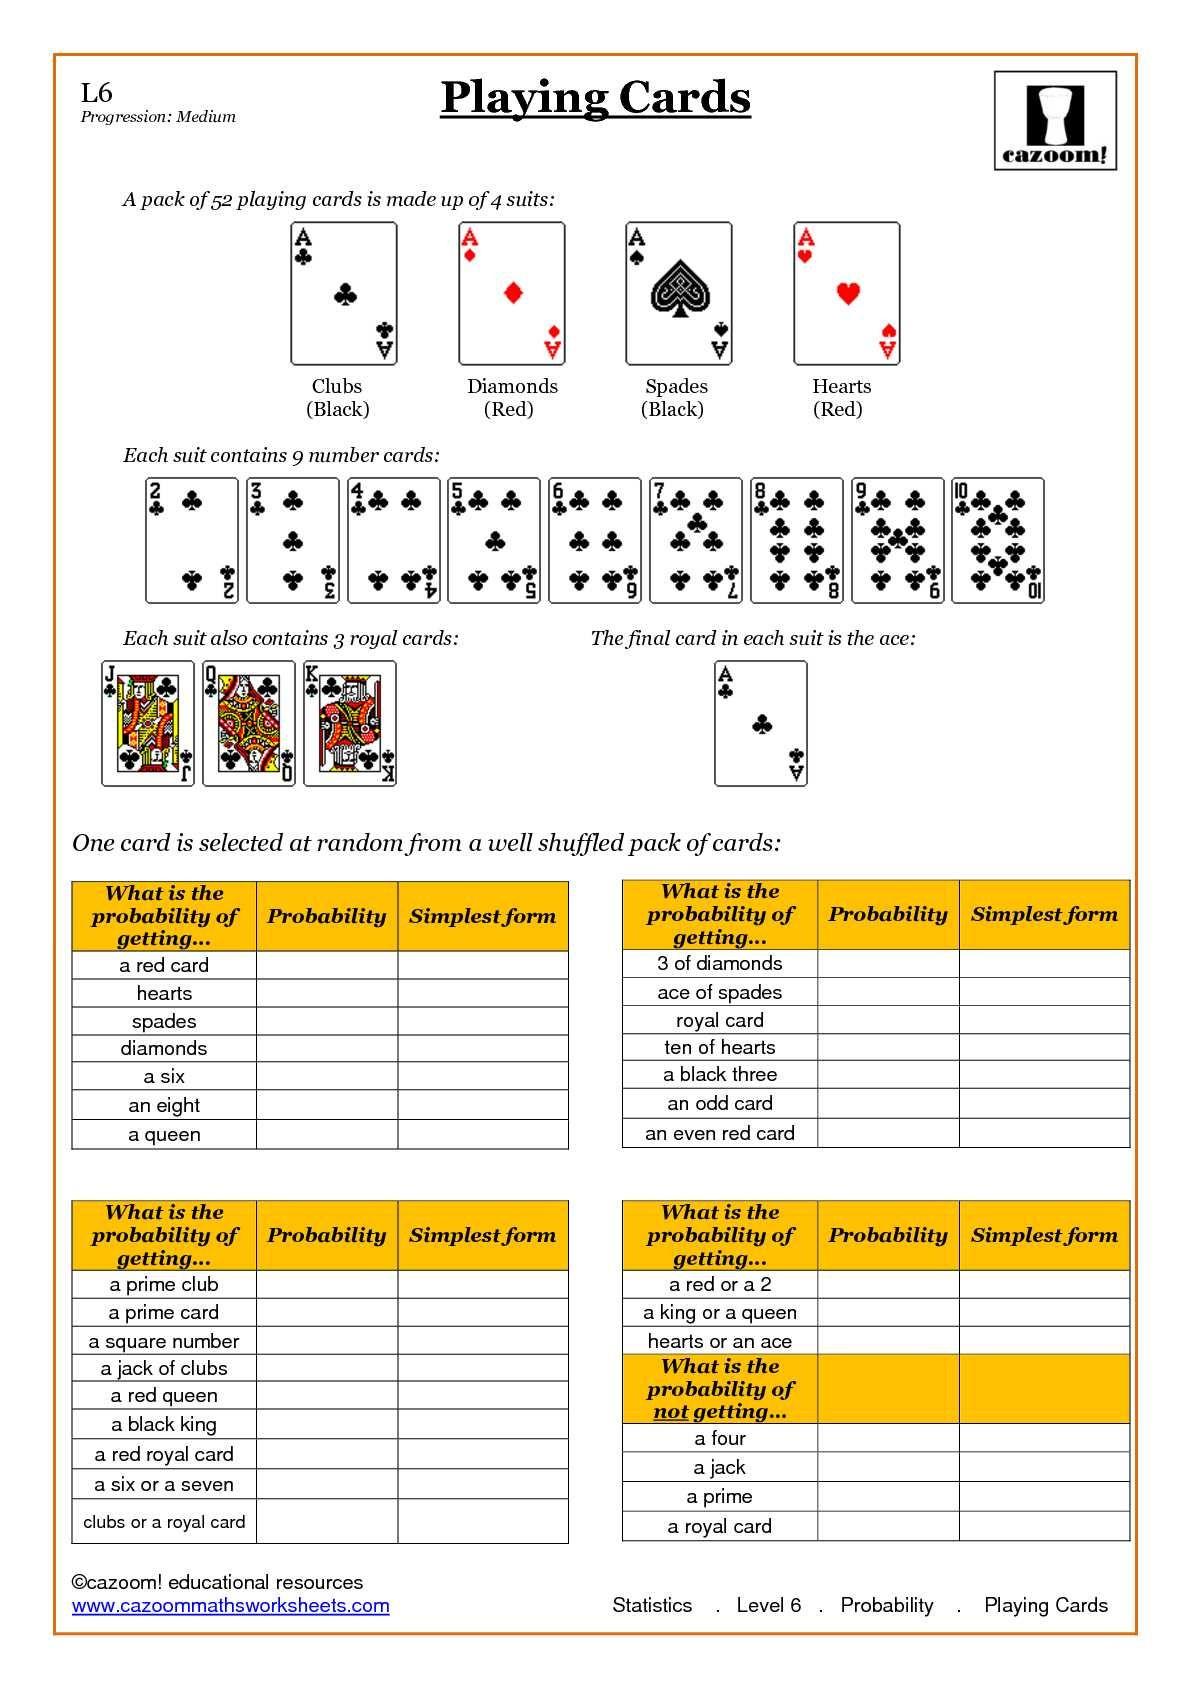 Statistic Maths Worksheets | Math | Math Worksheets, Probability - Free Printable Statistics Worksheets